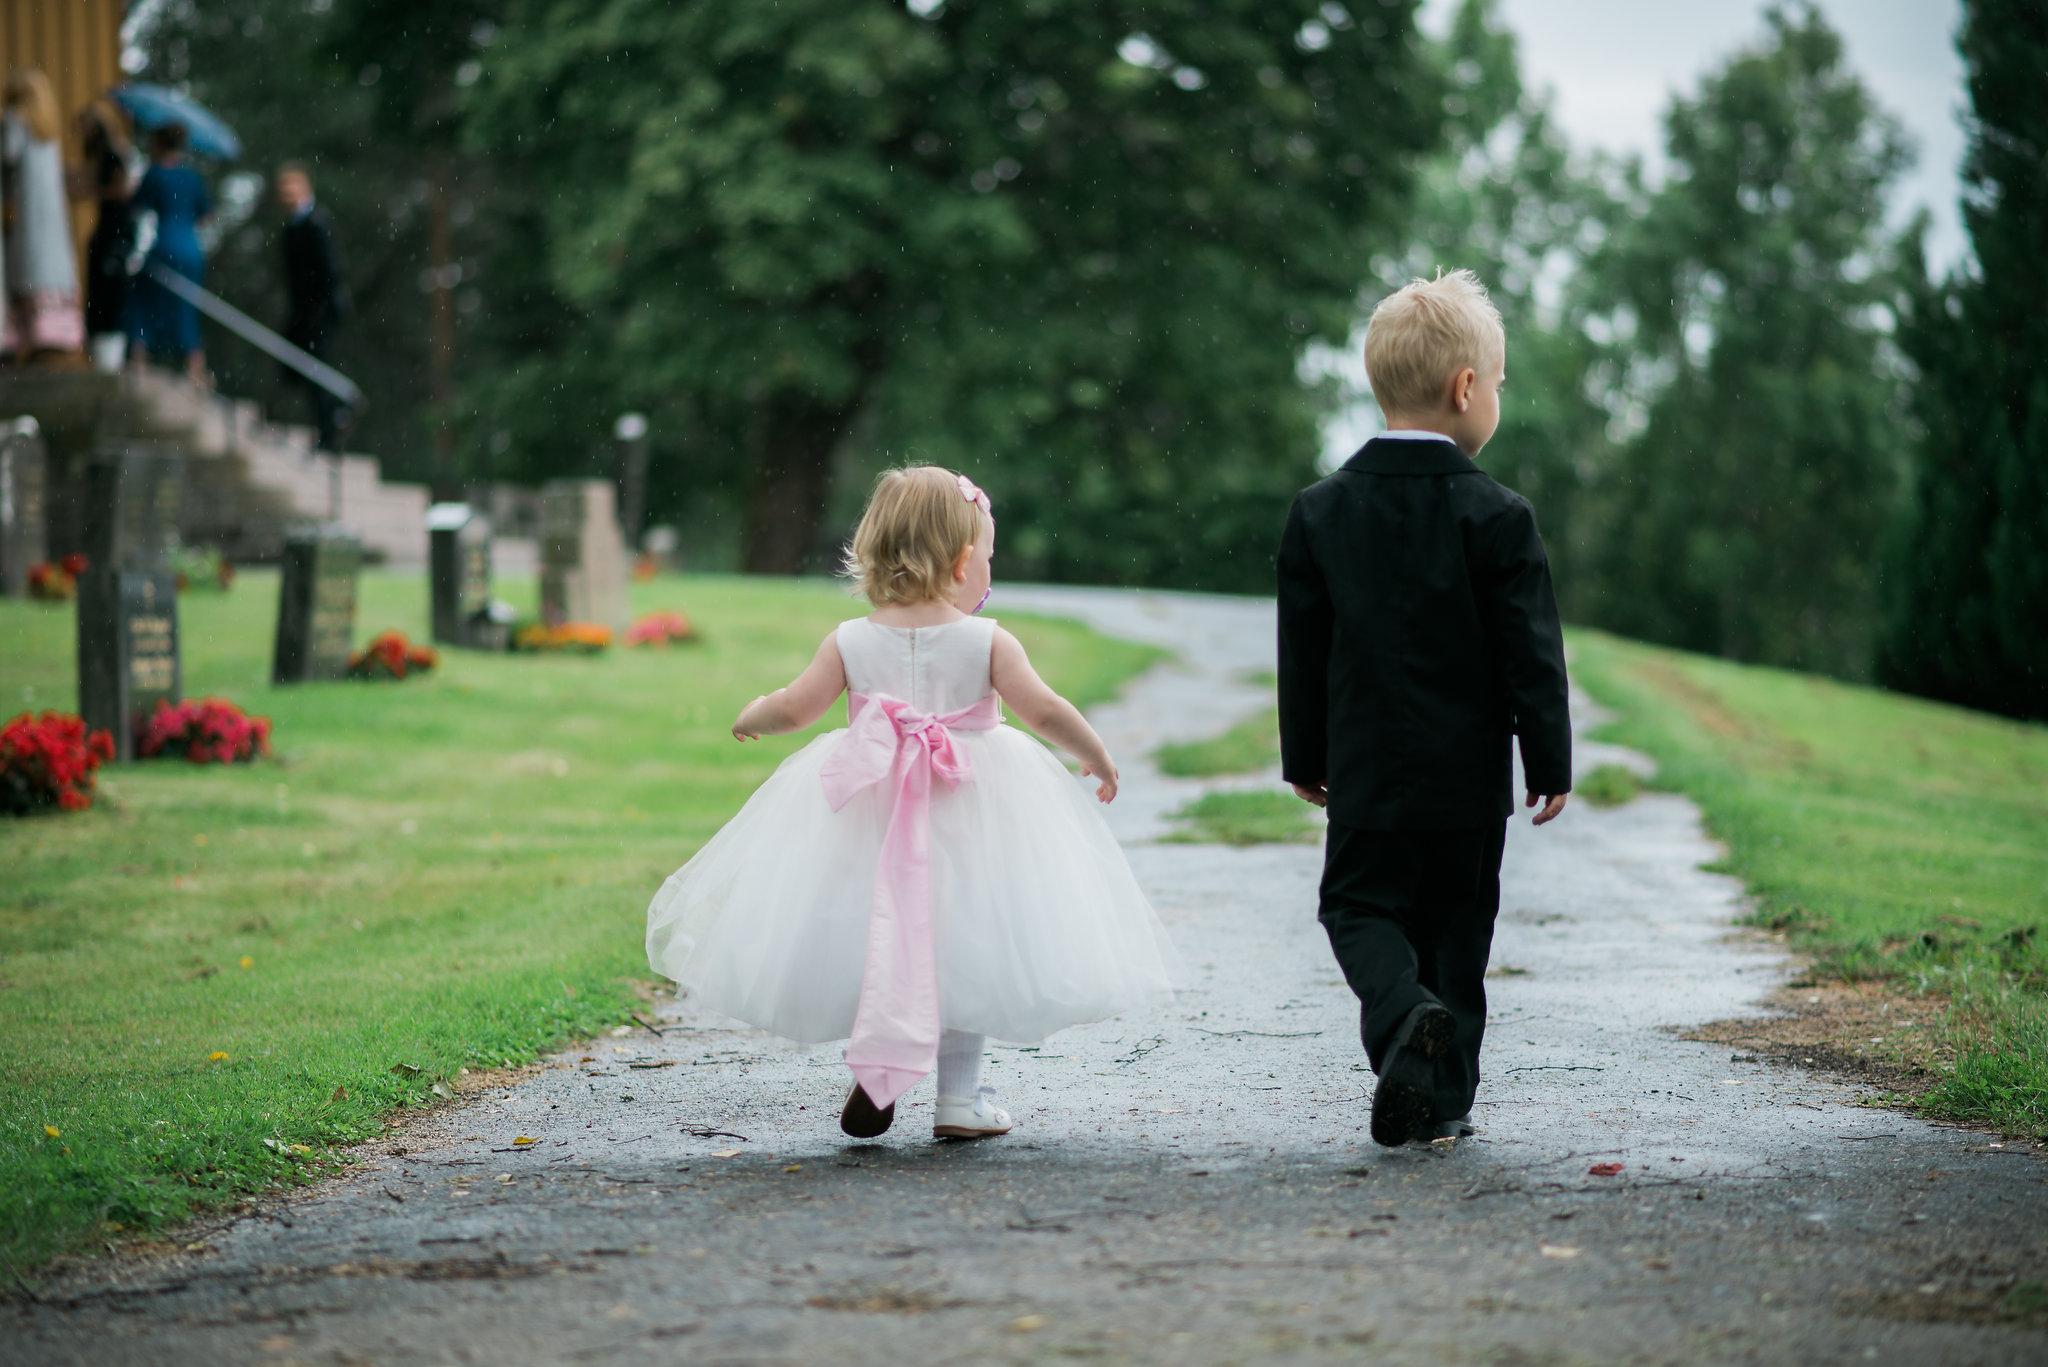 _6007438-2fotograf-bryllup-tyrifjorden.jpg